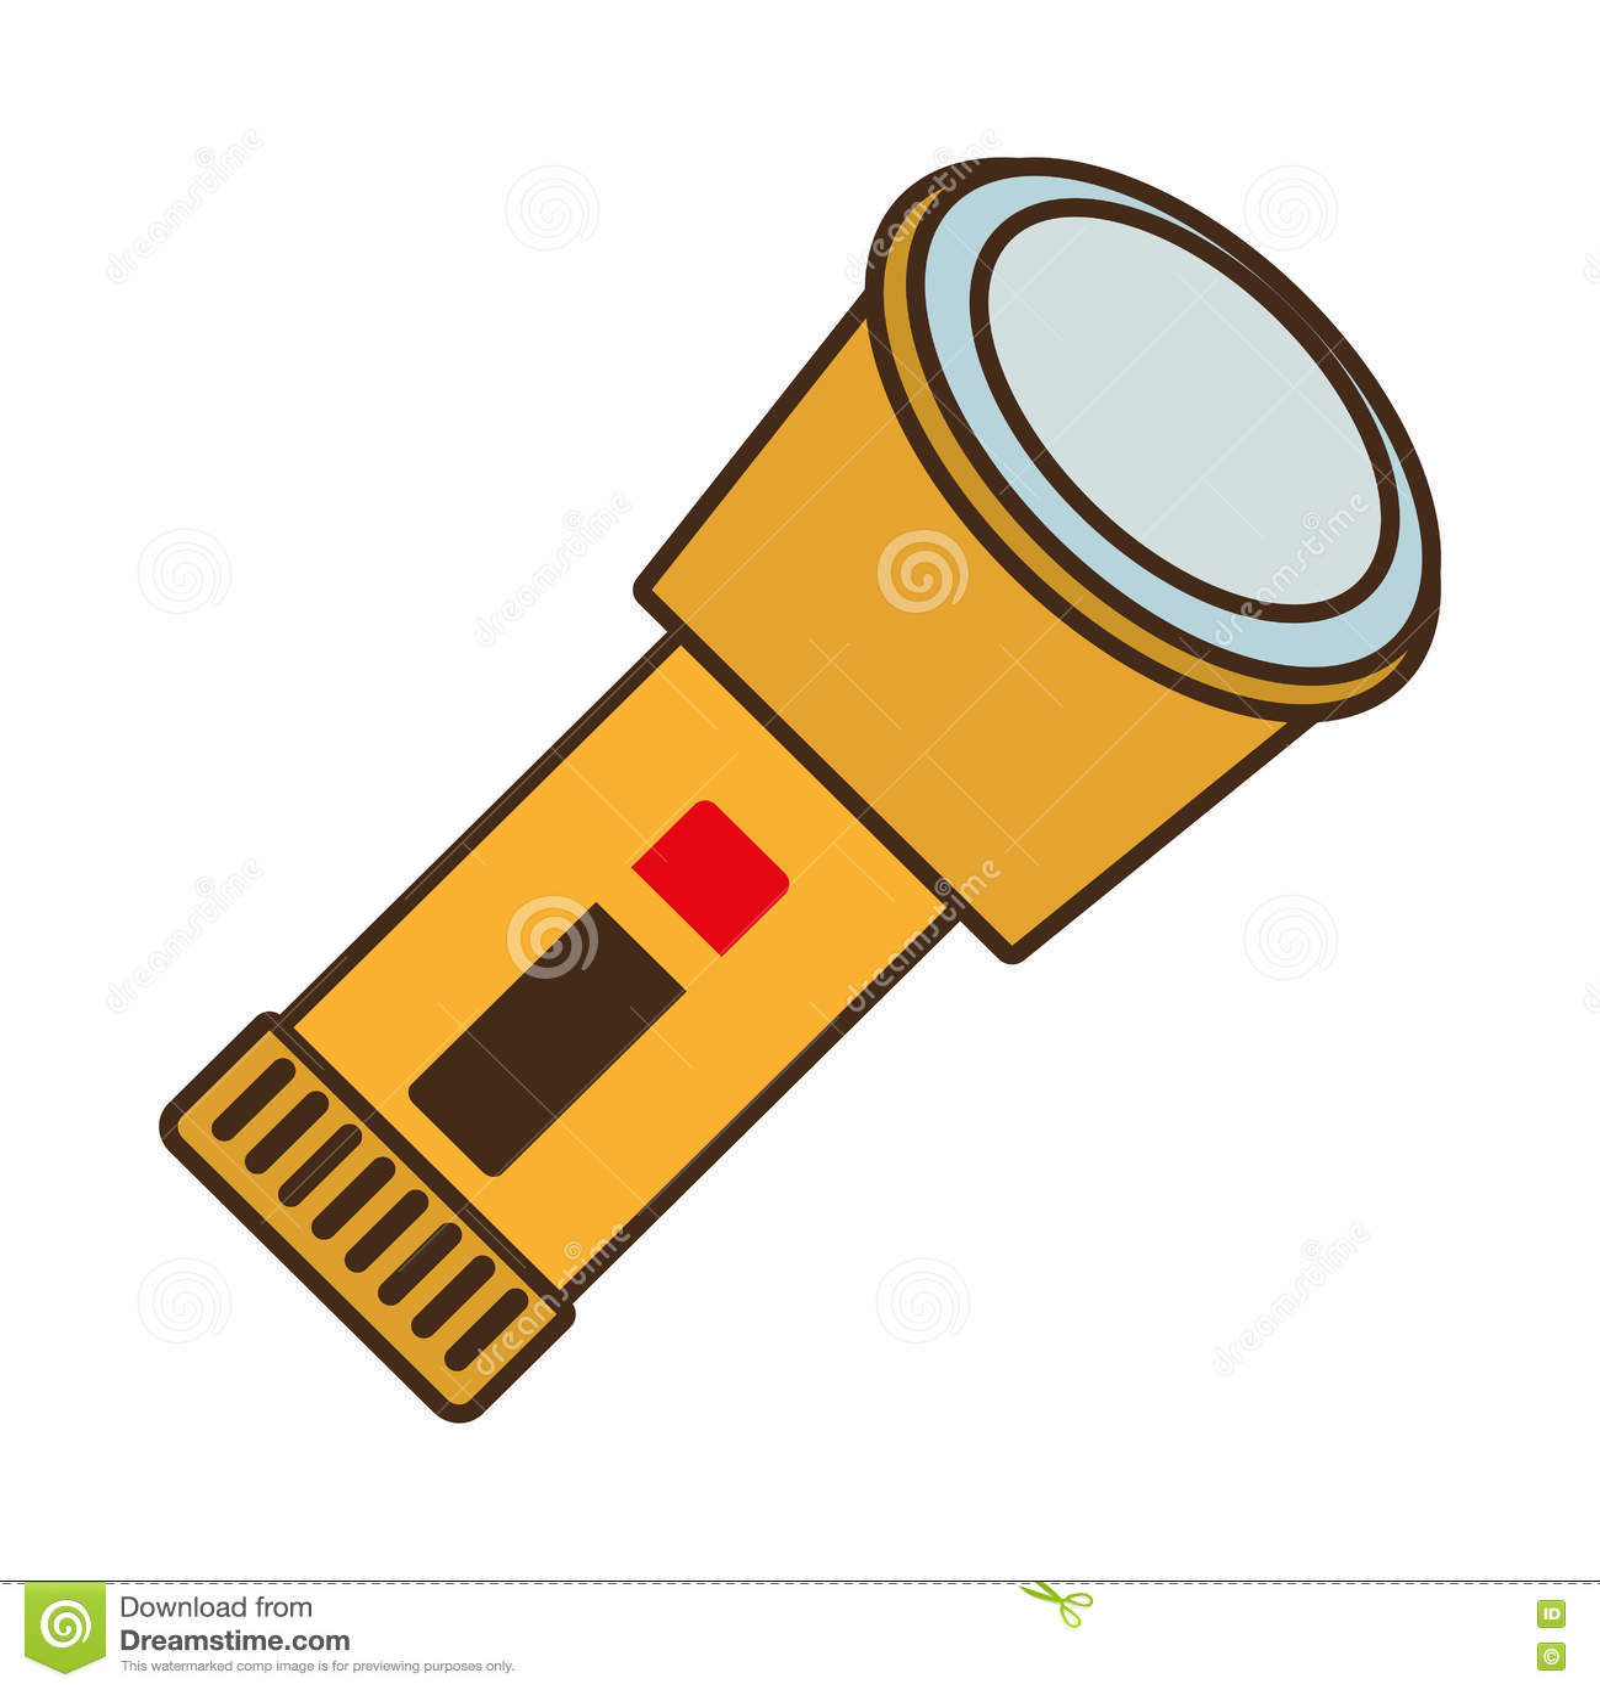 Cartoon Lantern Light Security Protective Work Design Stock